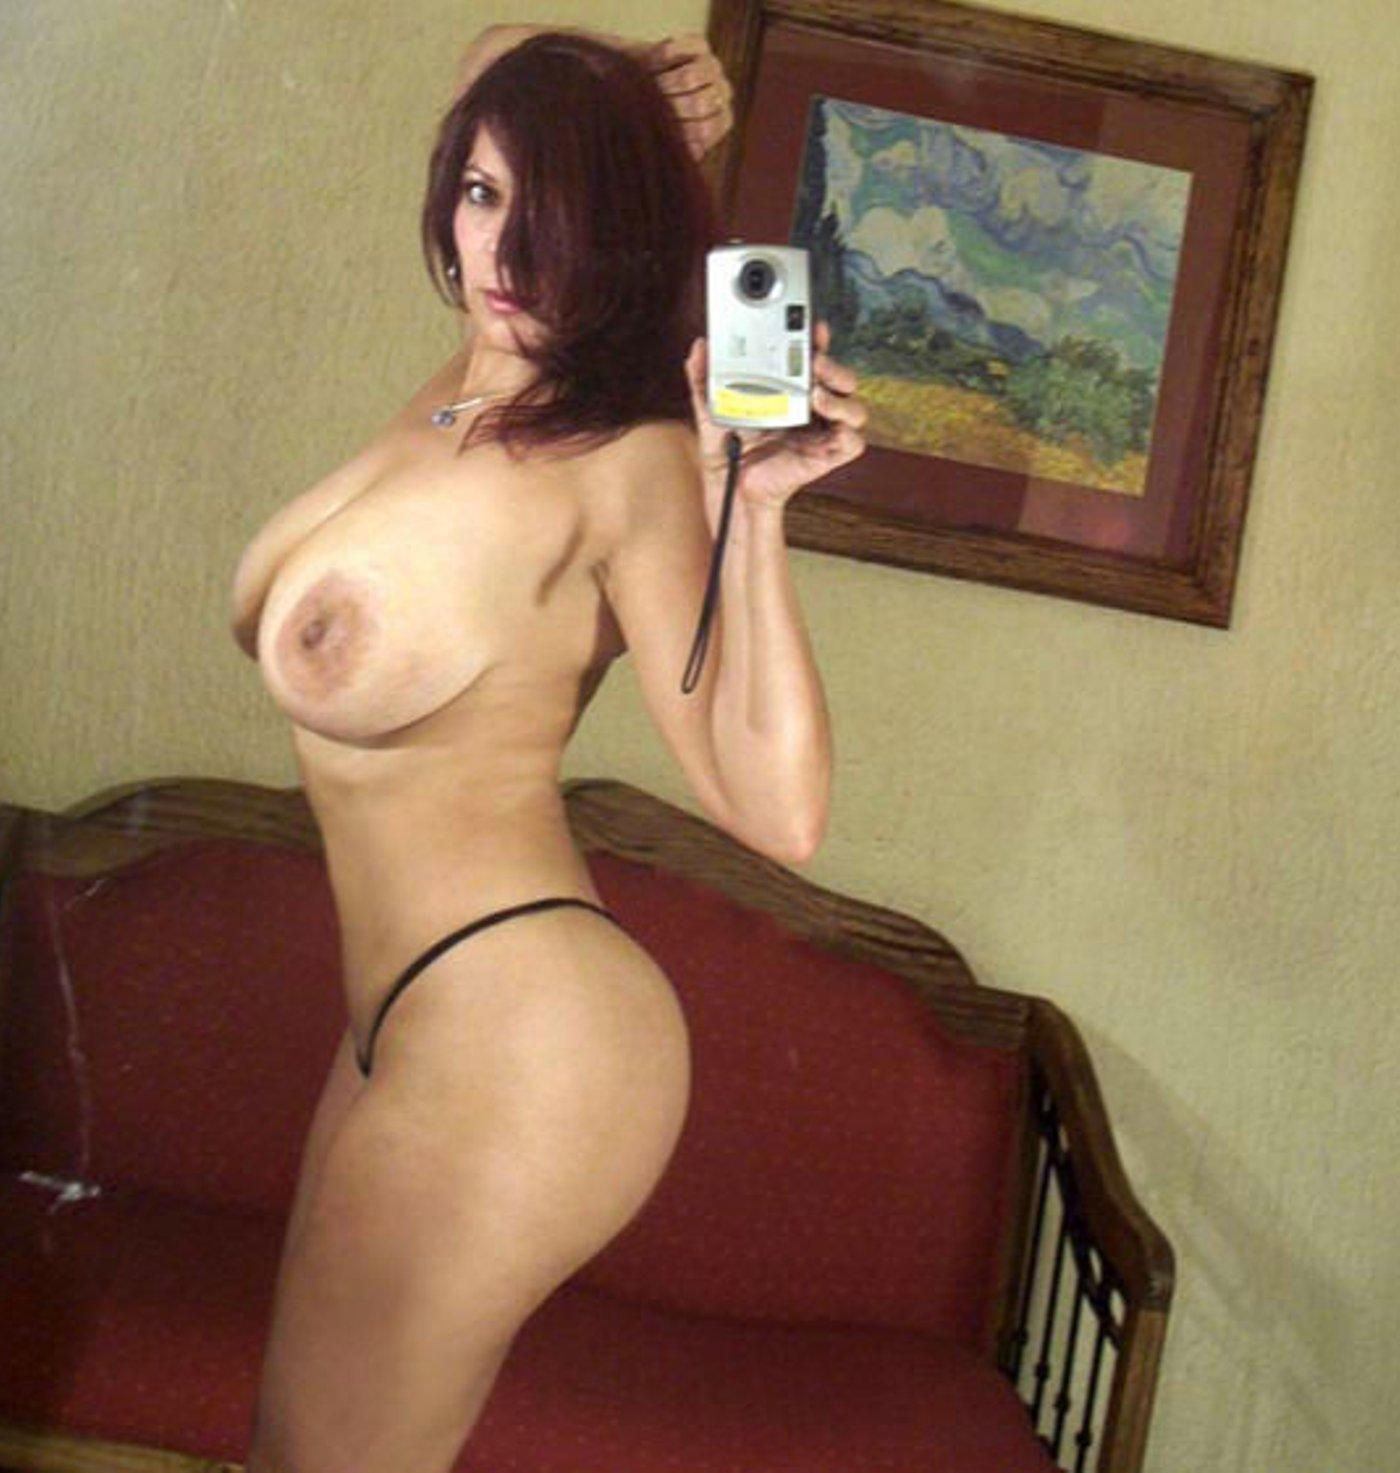 Sexy Maritza Mendez takes a self shot while posing without a bra